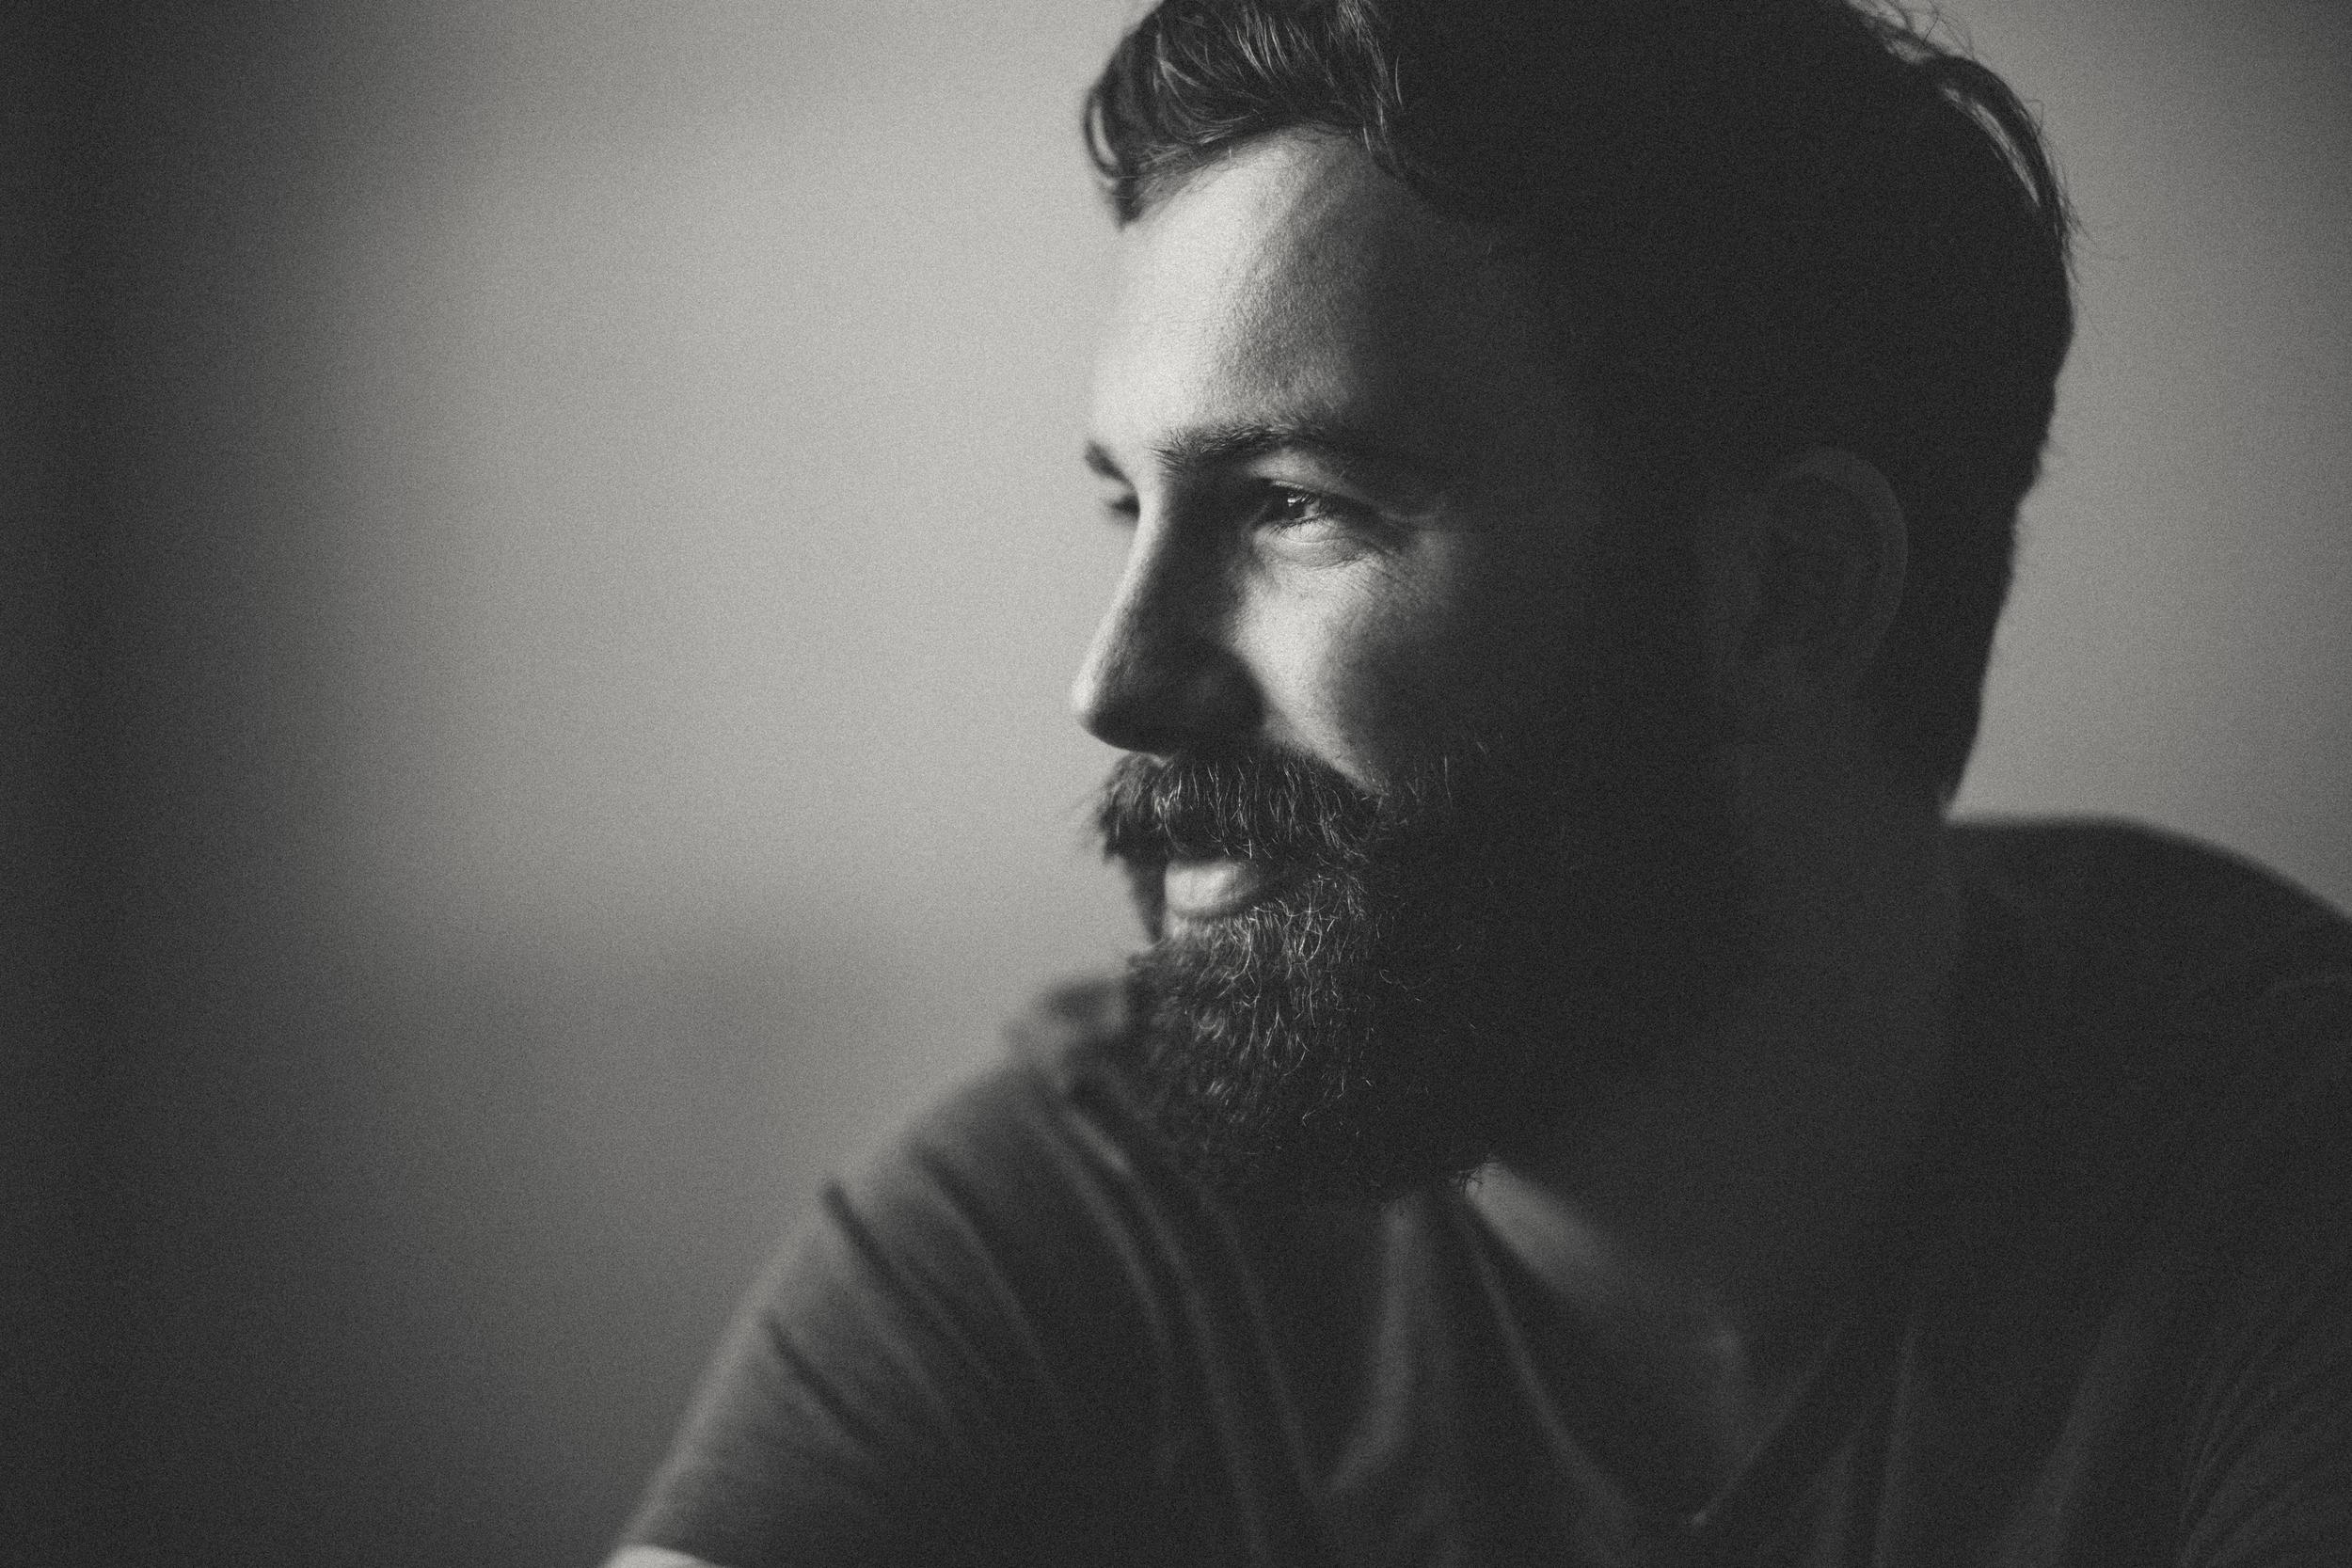 Daniel Alkato Smiling beard Black and White